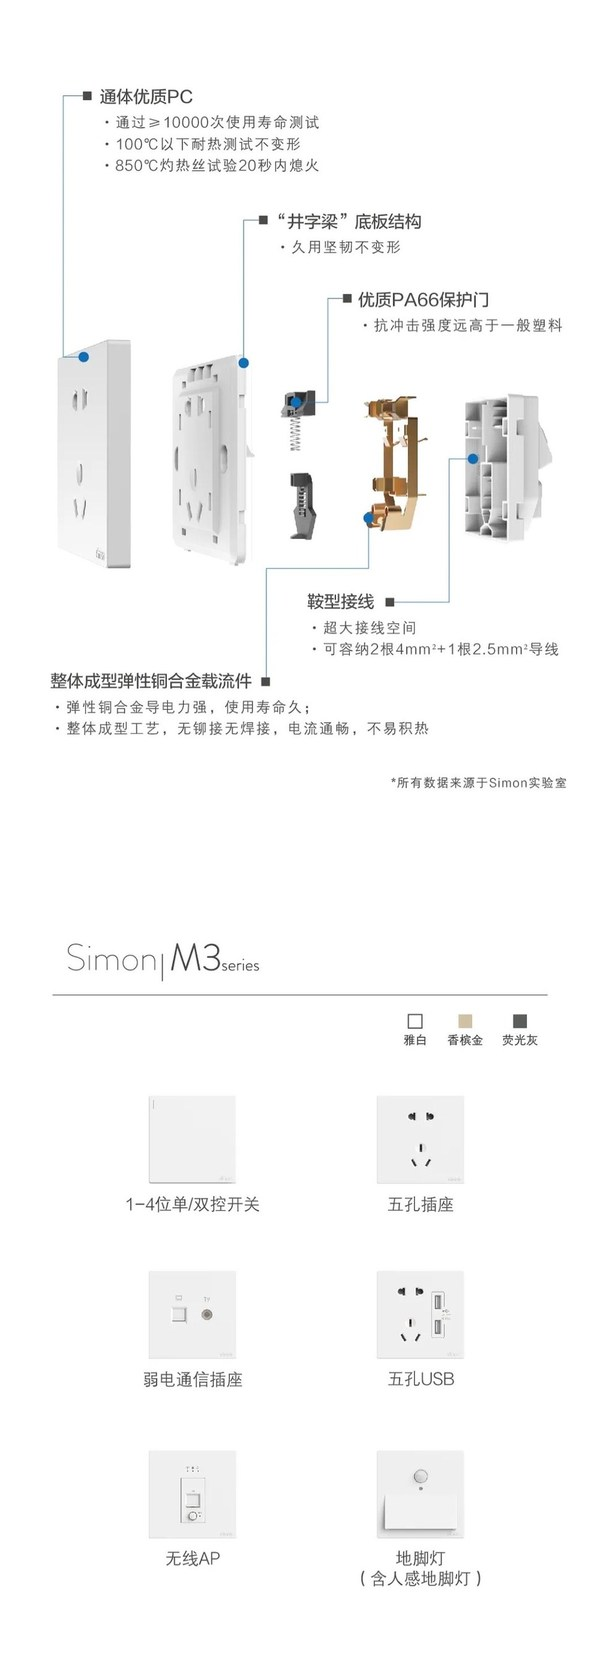 Simon M3 series新品上市 席卷无框面板新风潮